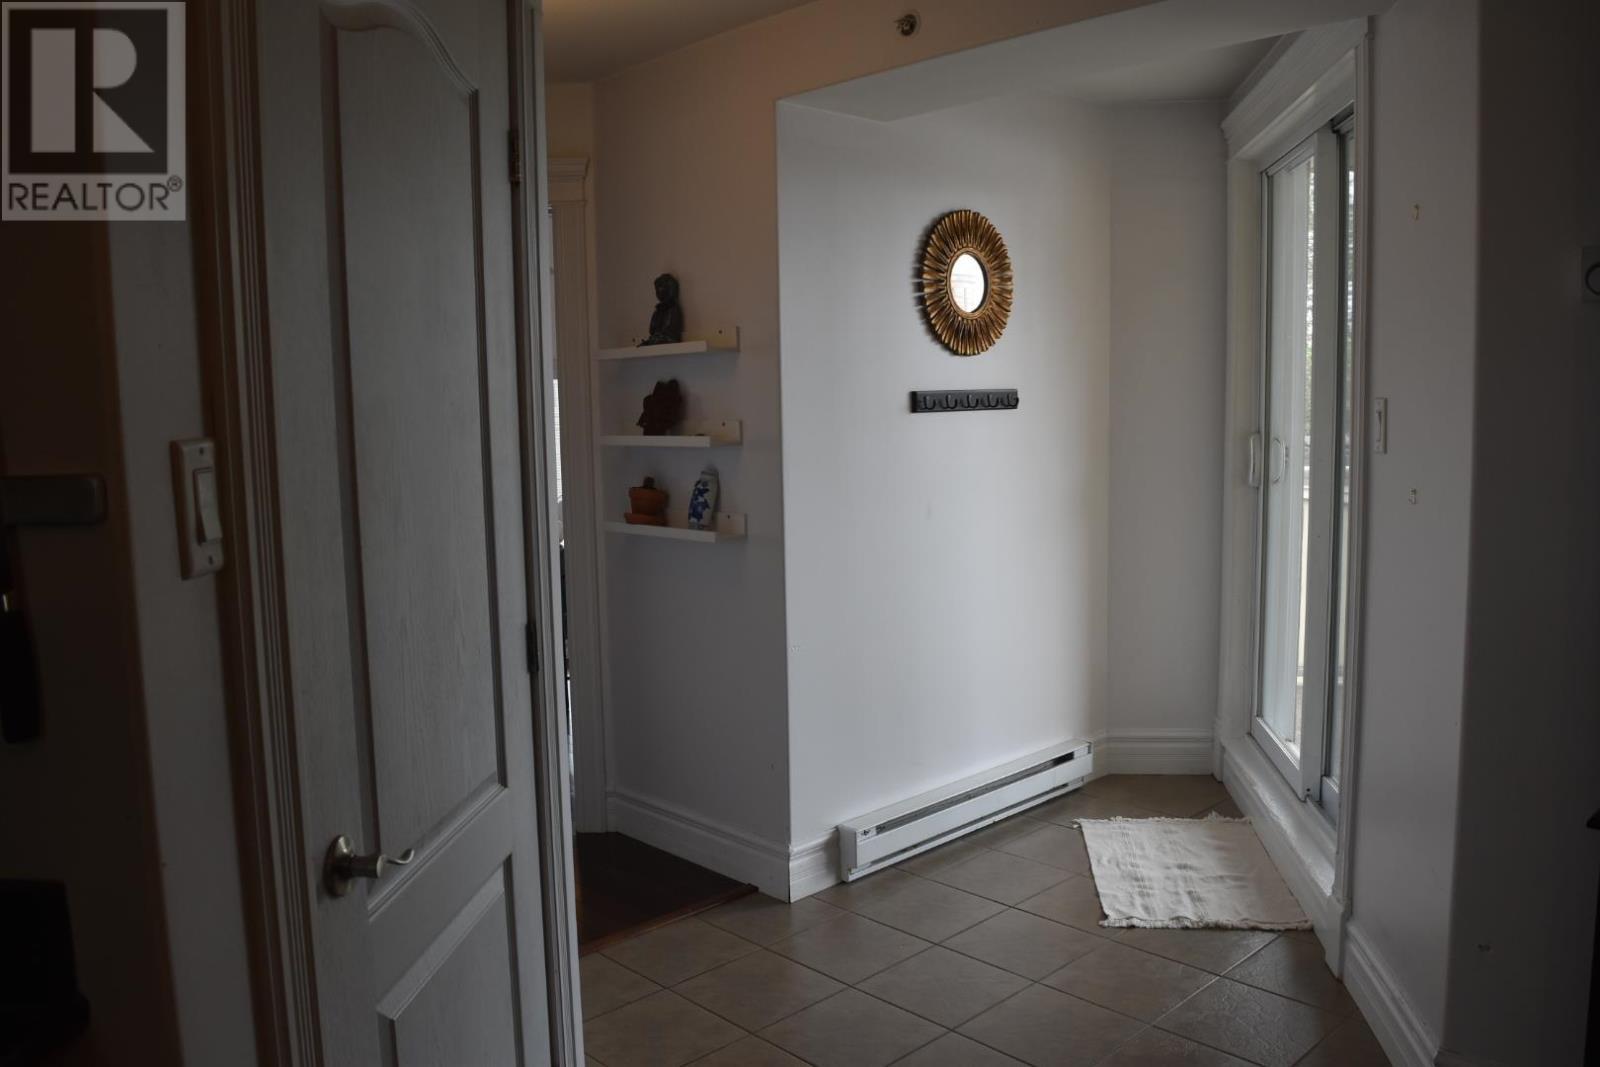 304 5689 Cunard Street, Halifax, Nova Scotia  B3K 1C7 - Photo 2 - 202118347